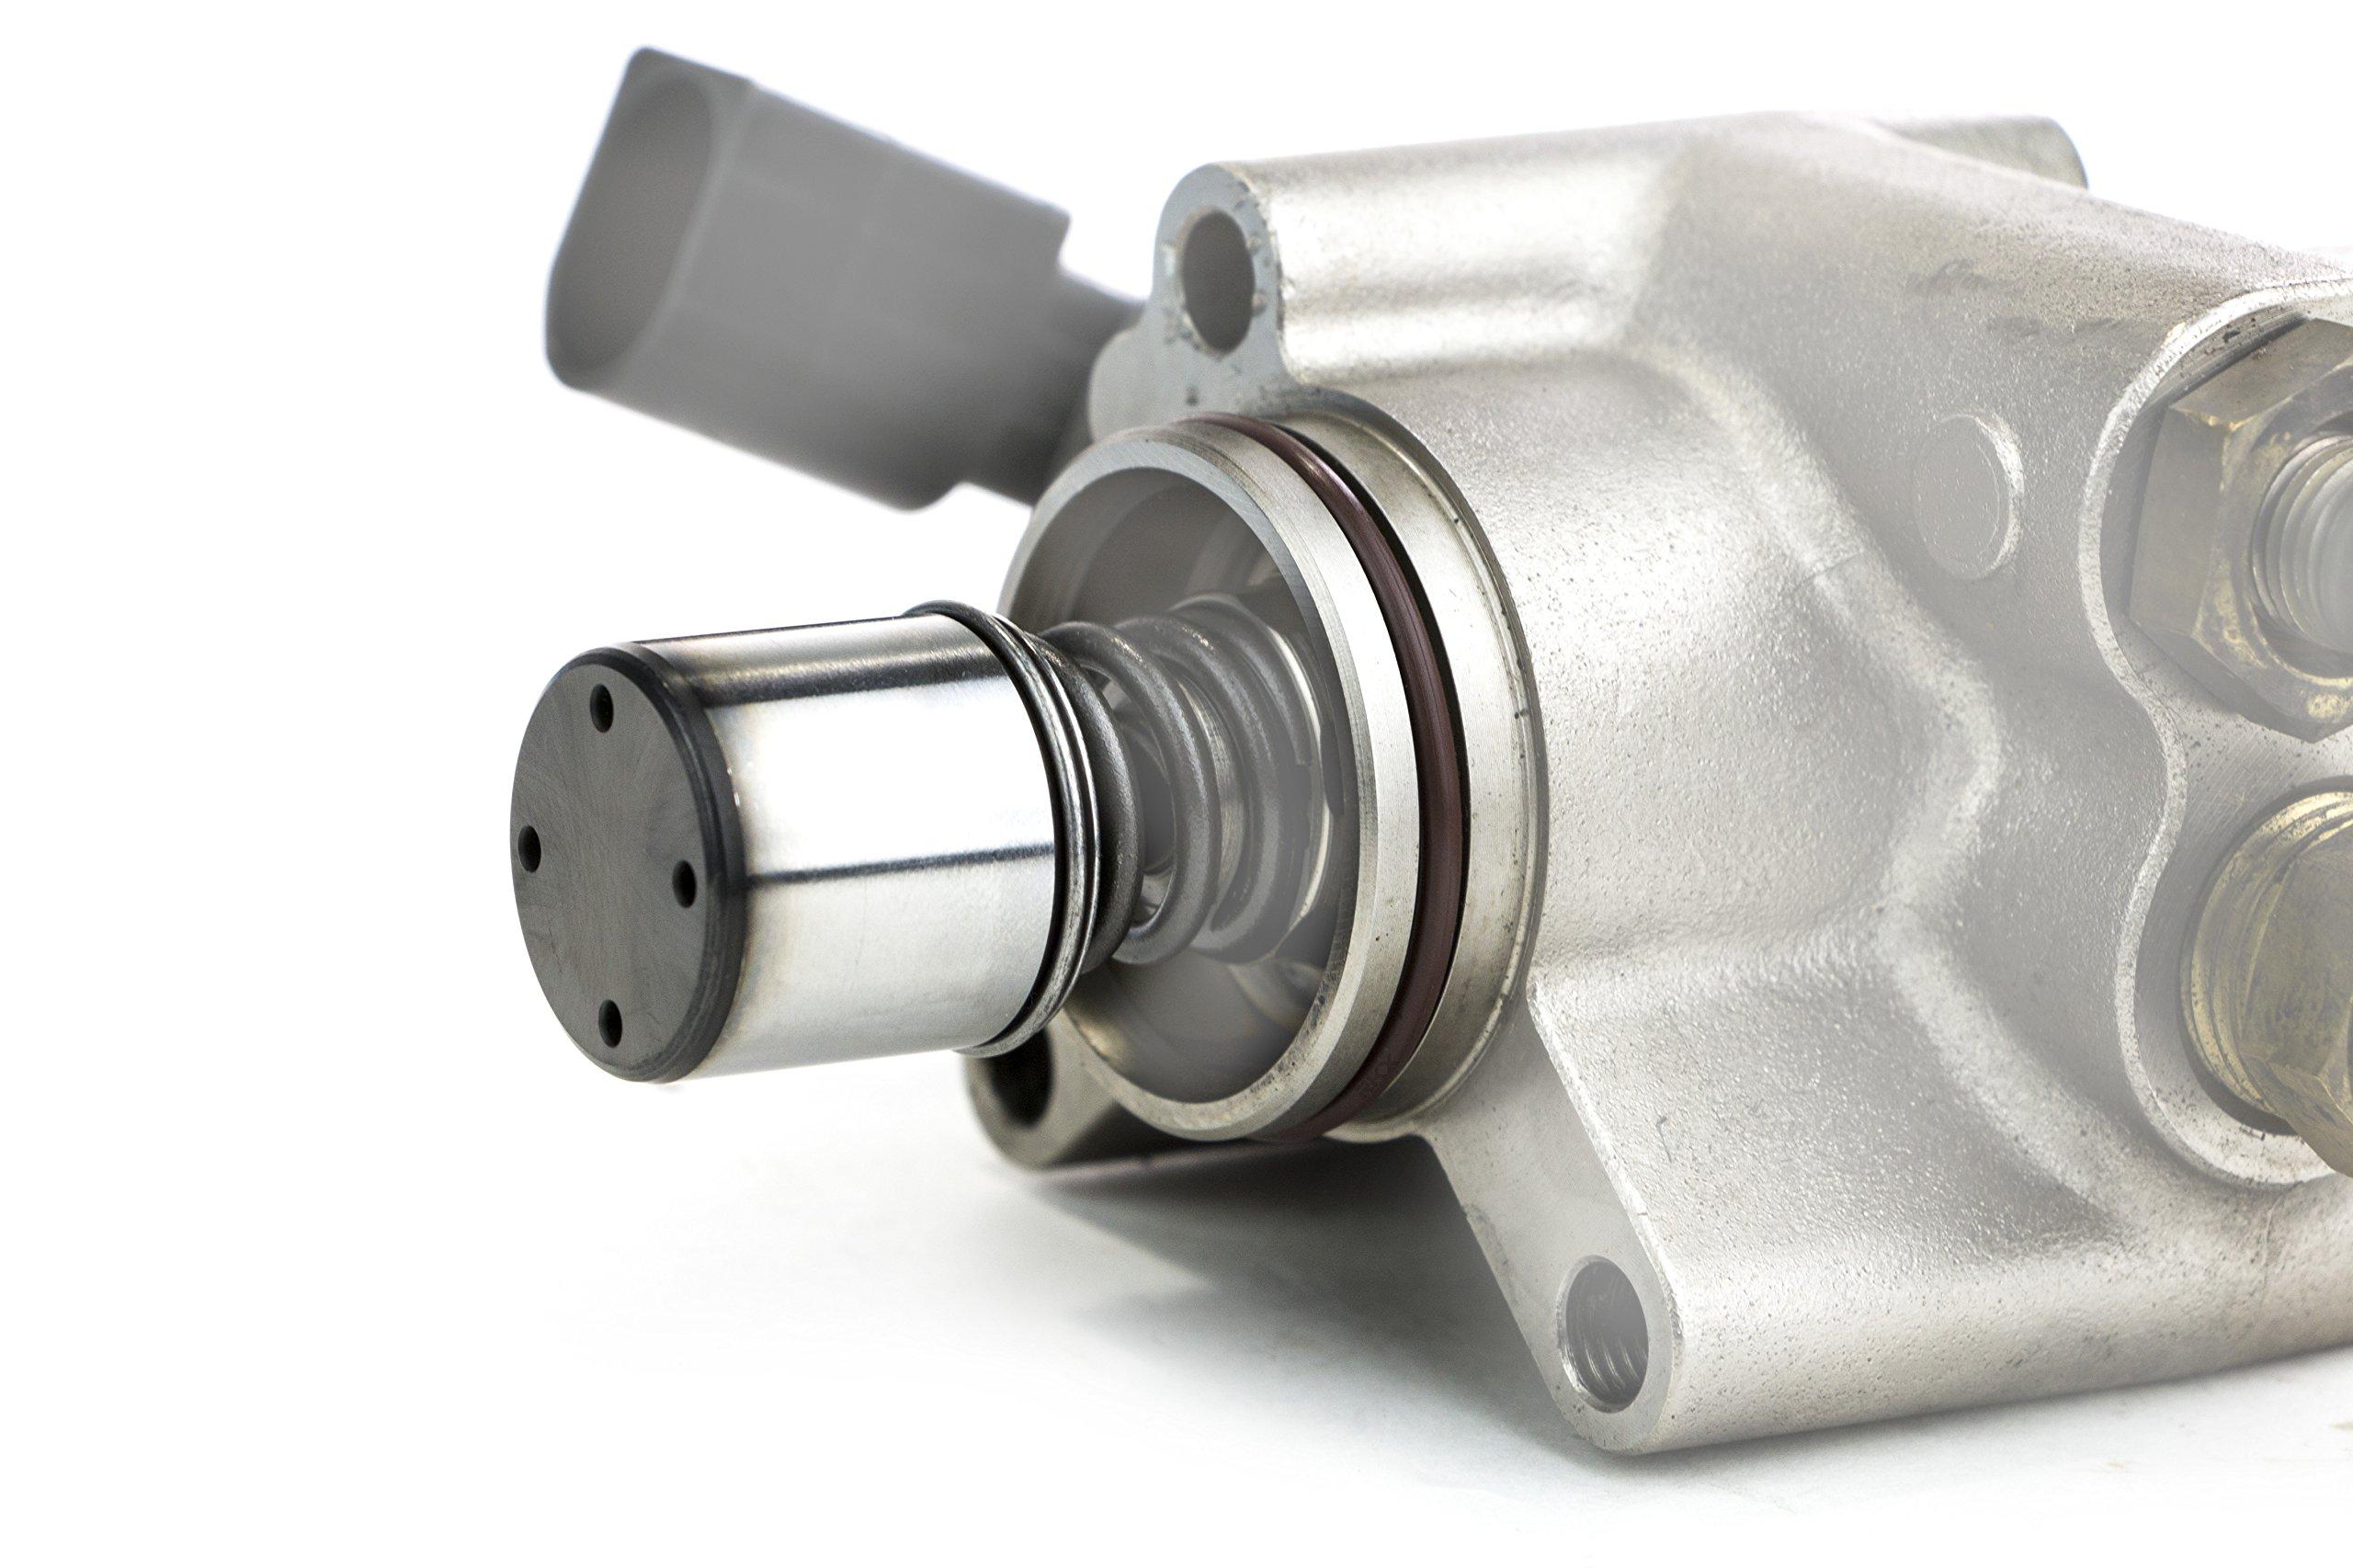 8P B6 B7 gasket FITS VW /& Audi 2.0T Vacuum Pump Re-seal Rebuild Kit 2.0 T MKv